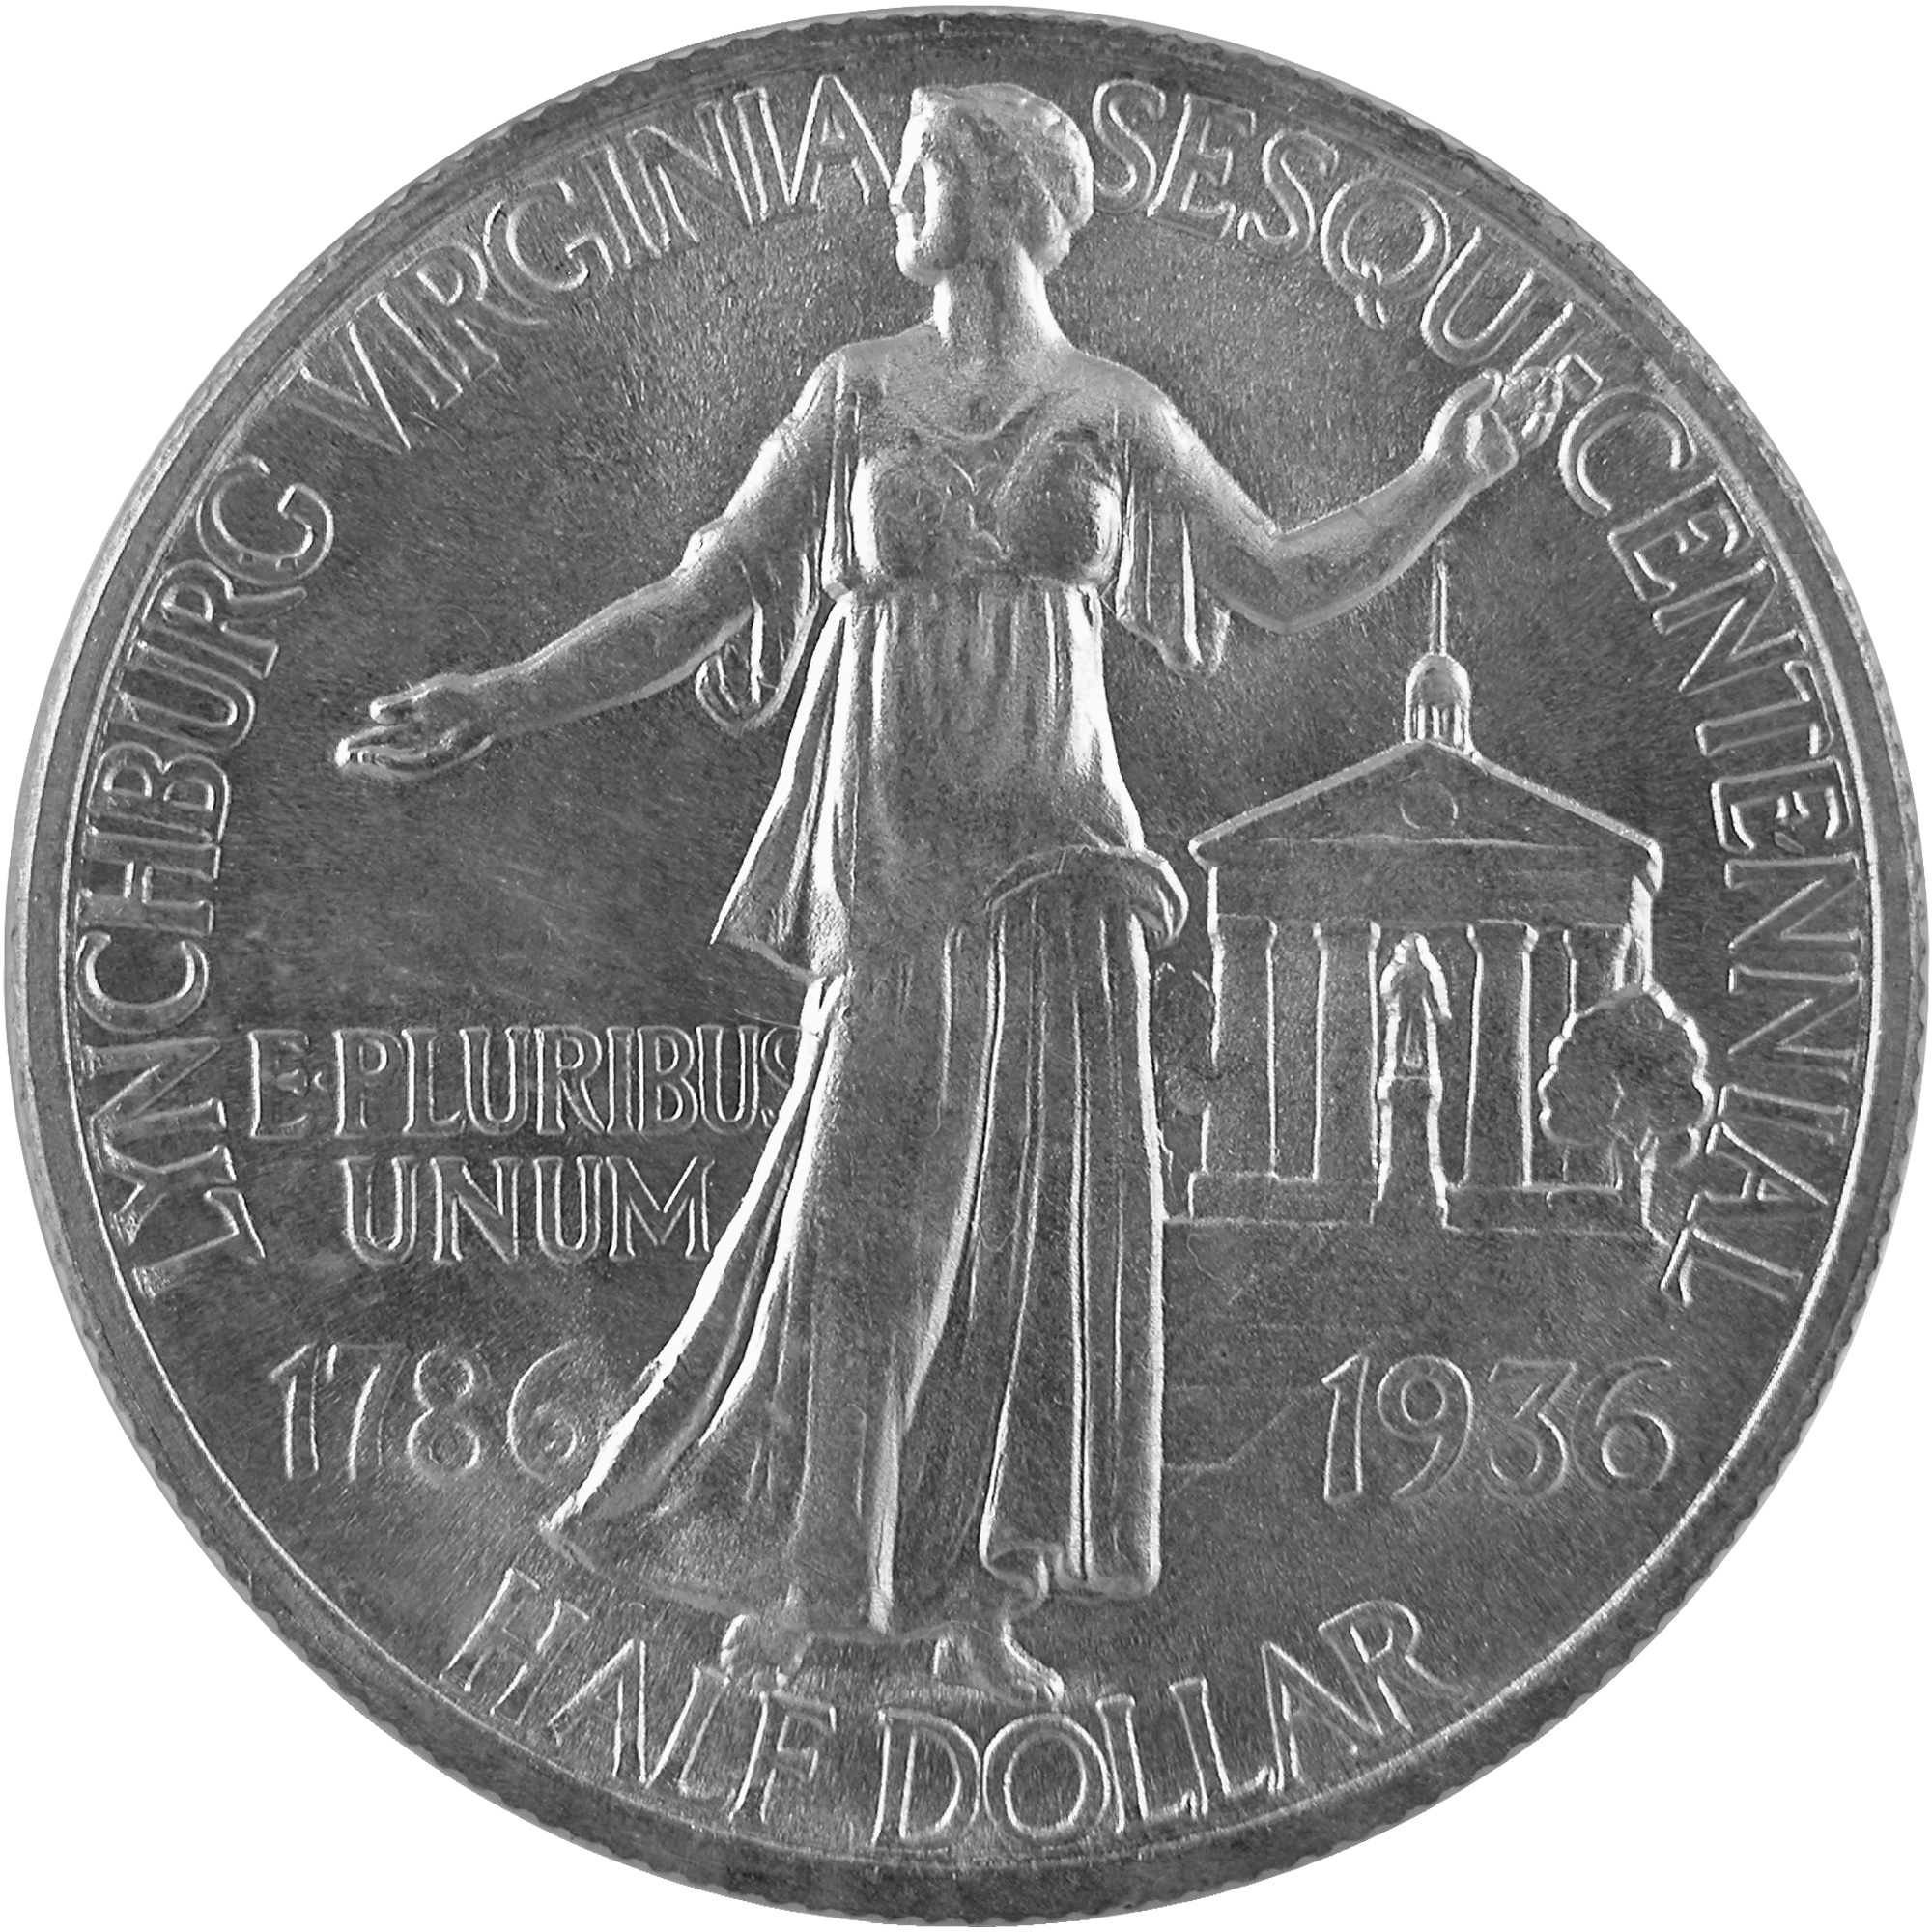 1936 Lynchburg Virginia Sesquicentennial Commemorative Silver Half Dollar Coin Reverse